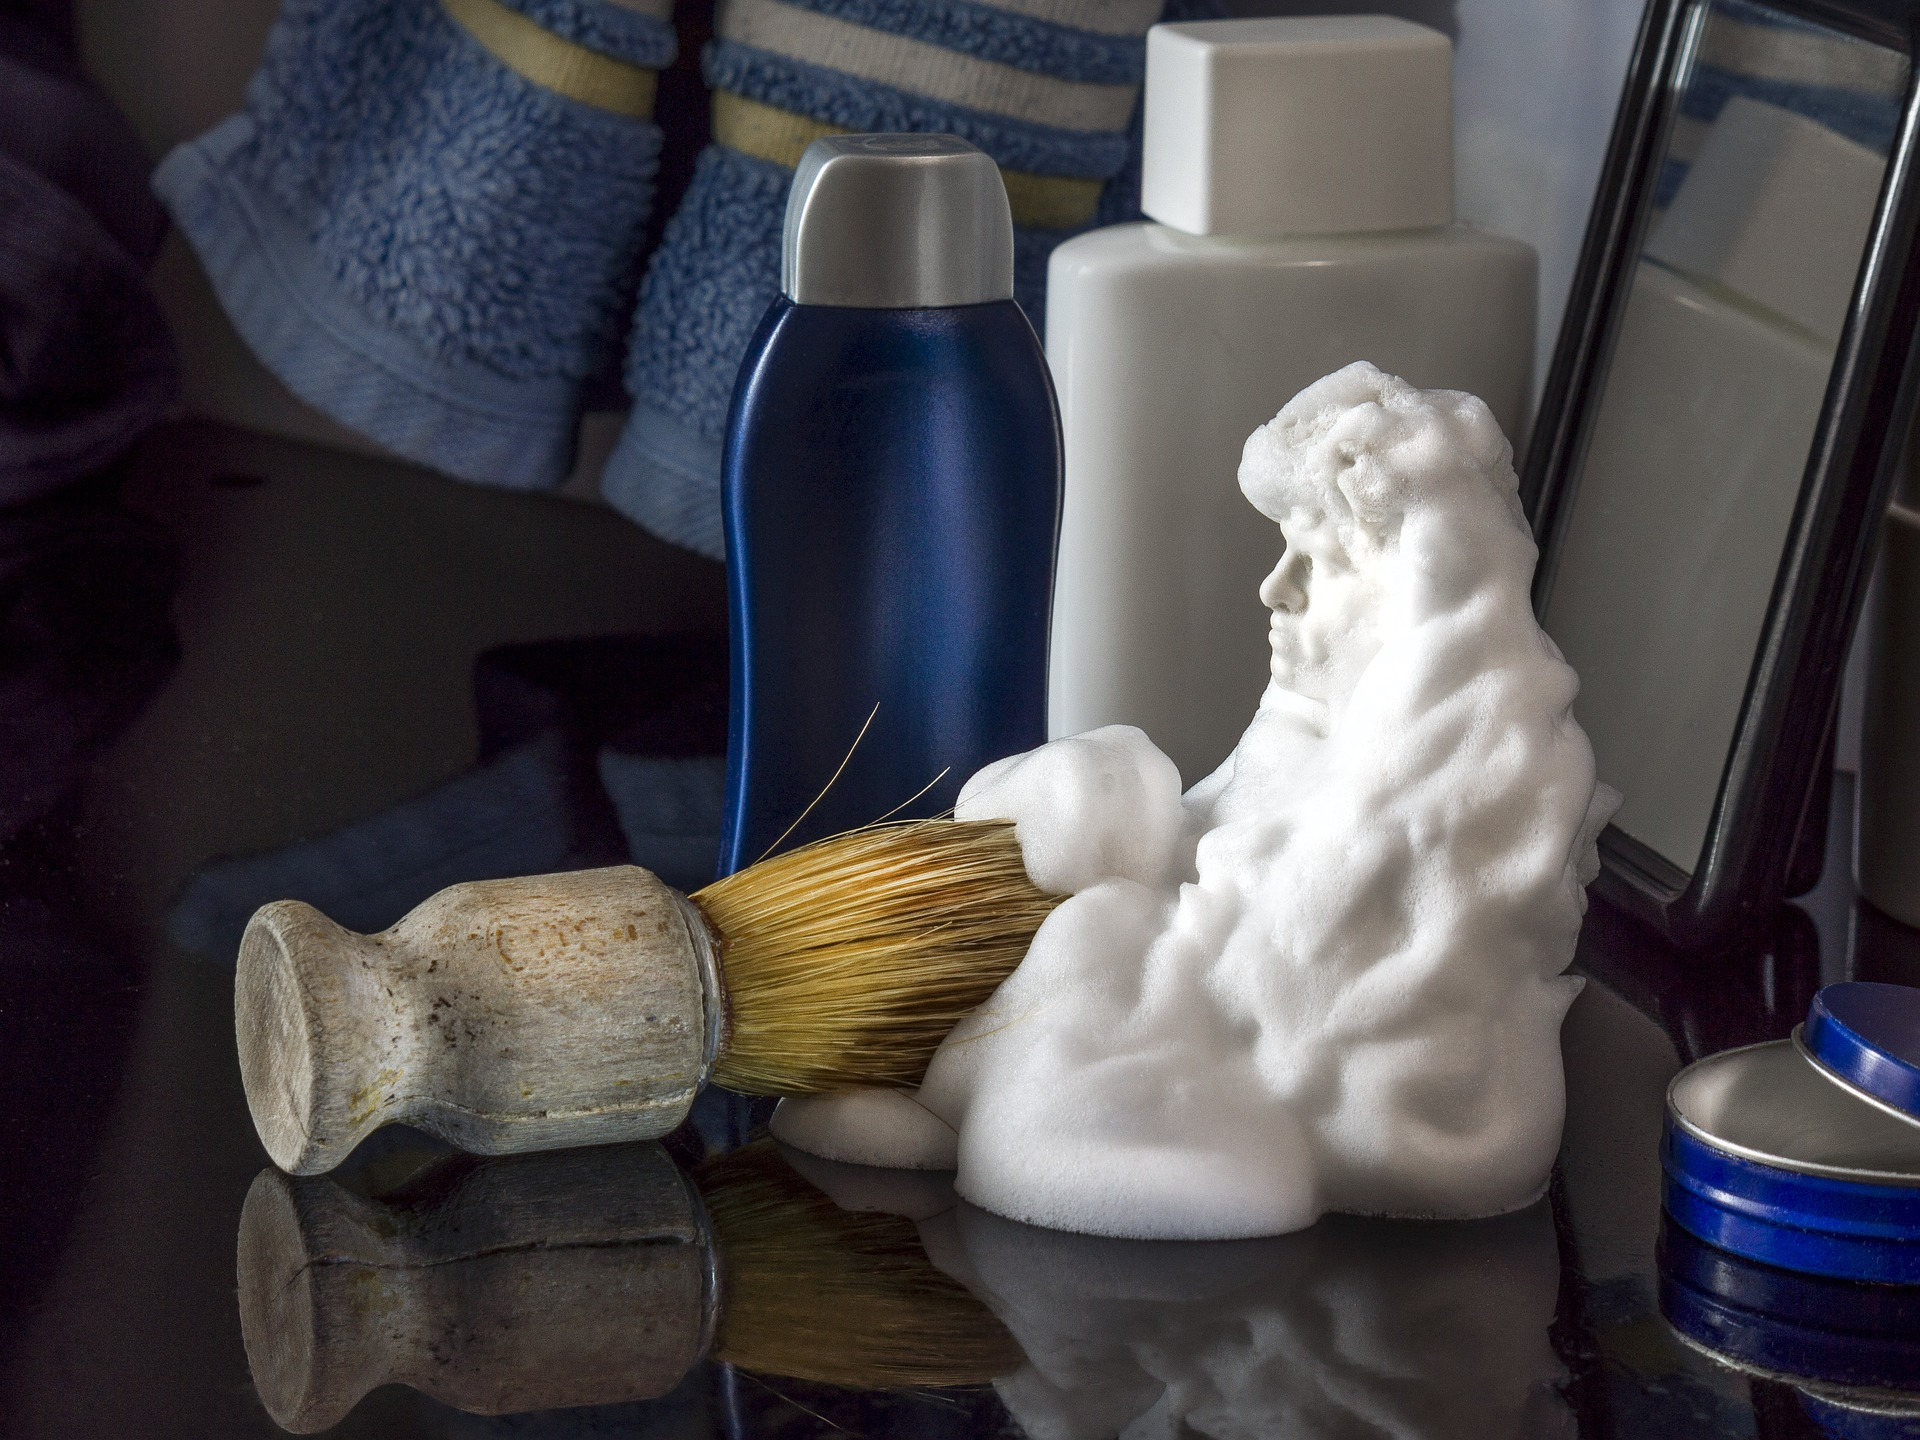 Read more about the article מדריך: איך לגלח את הפנים מבלי להיפצע?